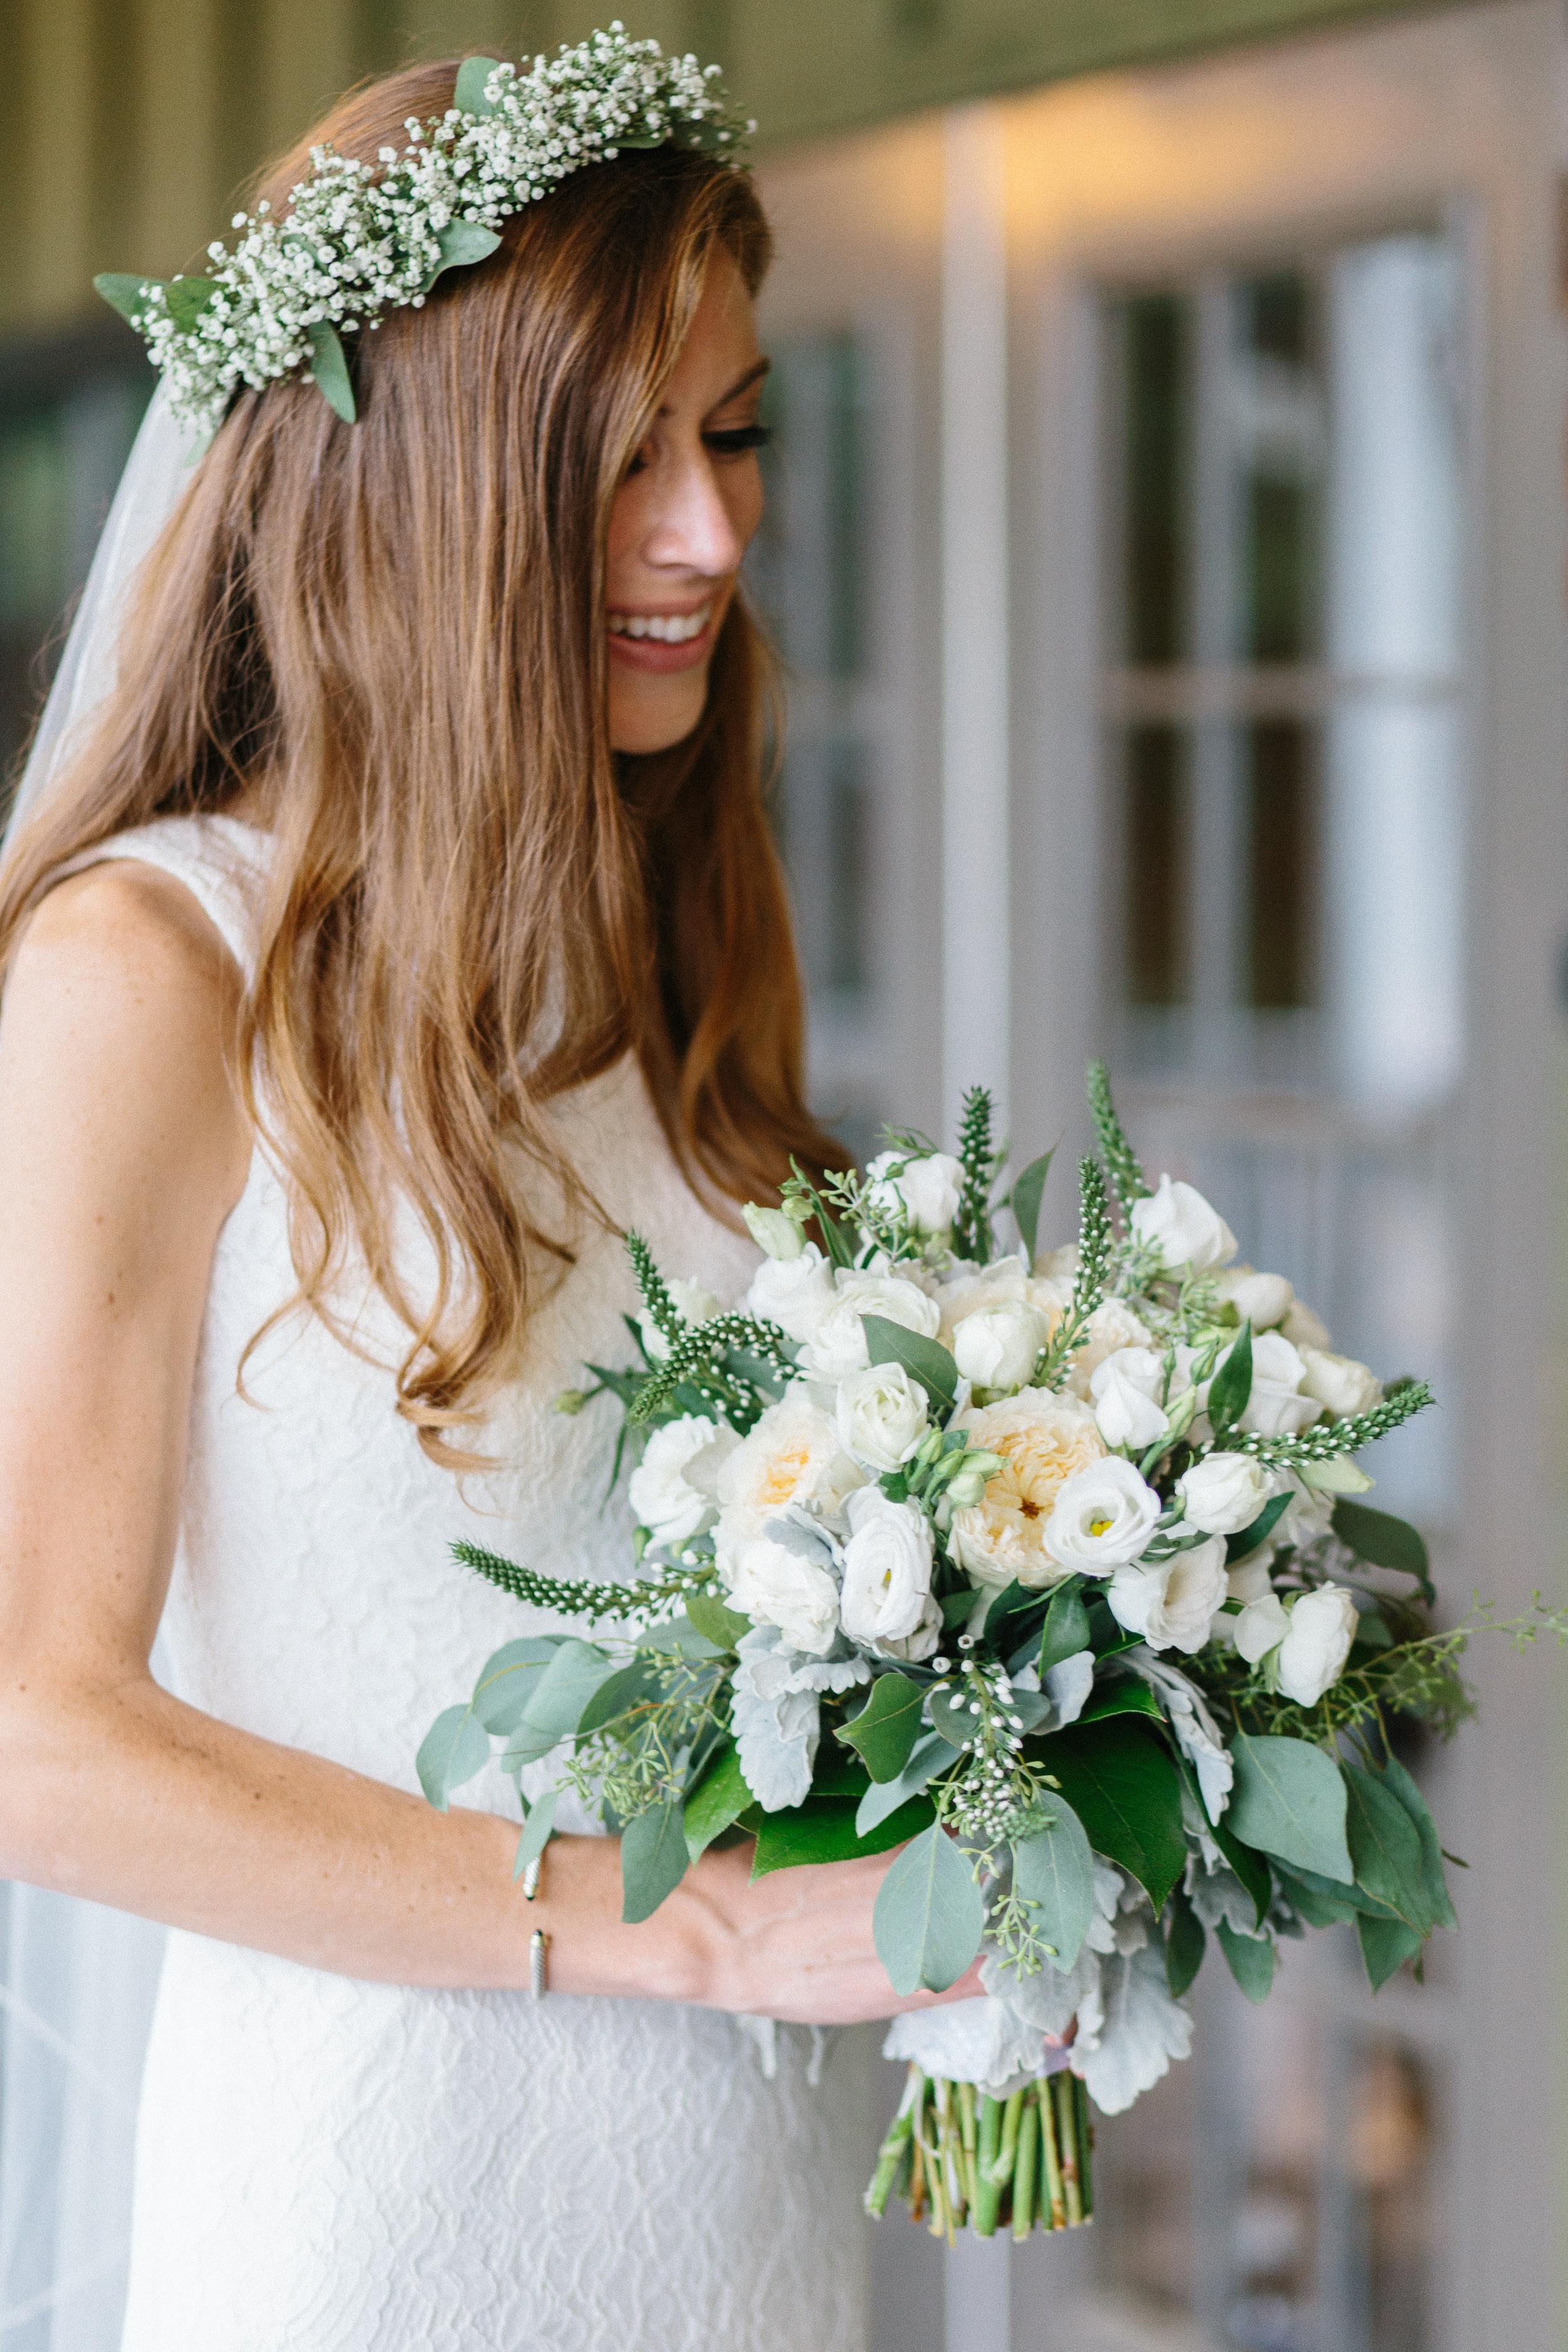 Jeffs-flowers-bridal-wedding-bouquet